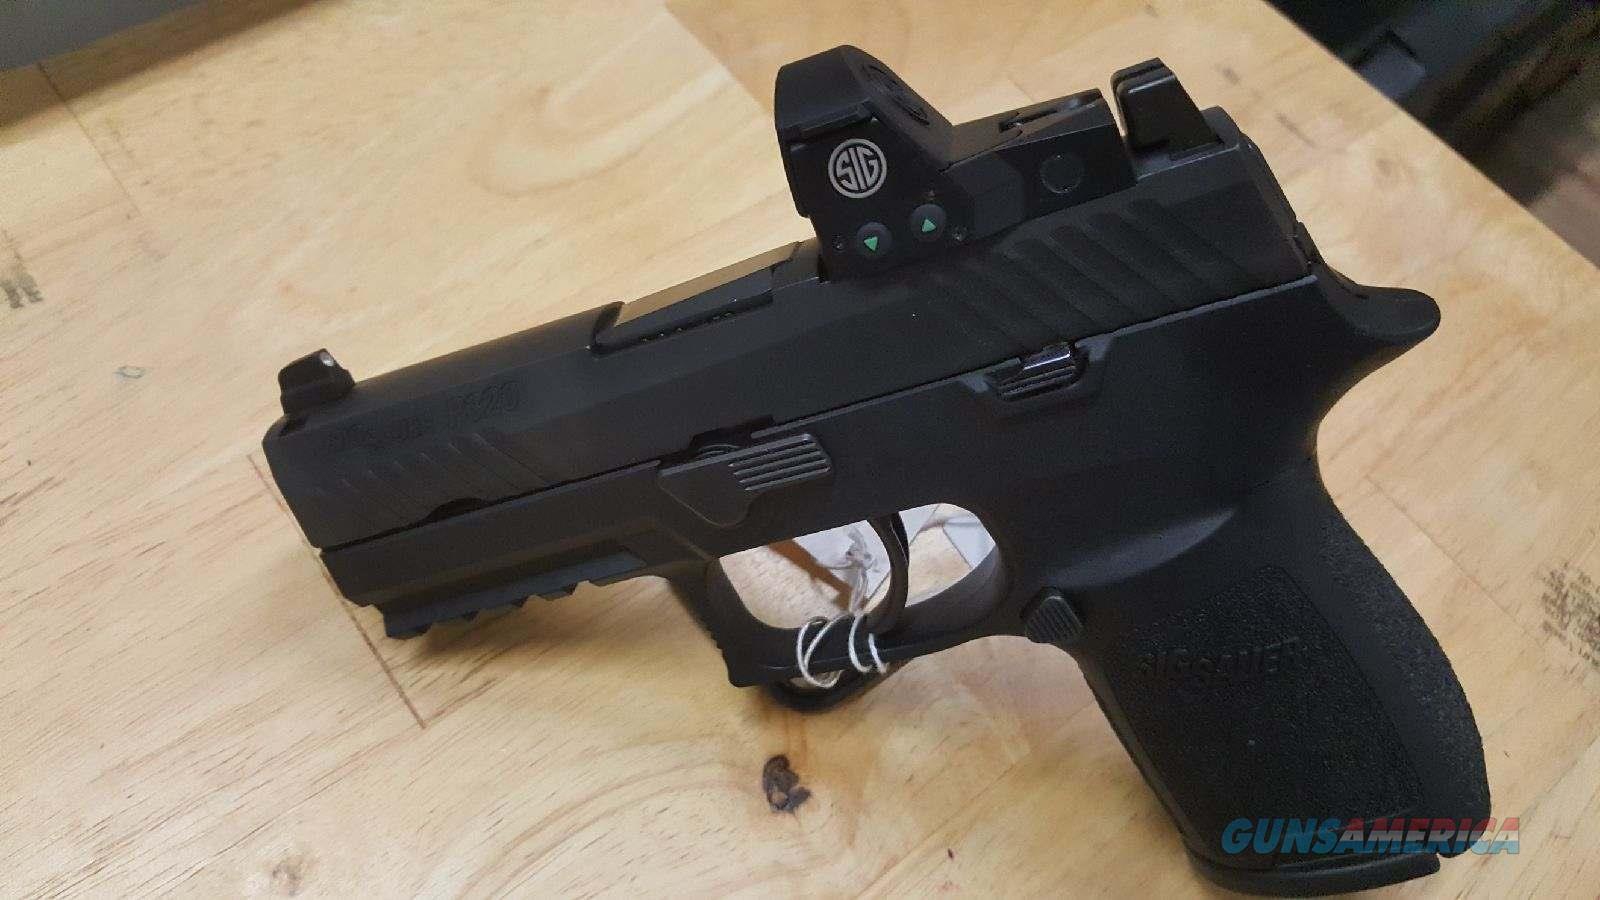 Sig 320 Compact RX W/Night Sights and Sig Romeo, 9mm! New in Box  Guns > Pistols > Sig - Sauer/Sigarms Pistols > P320